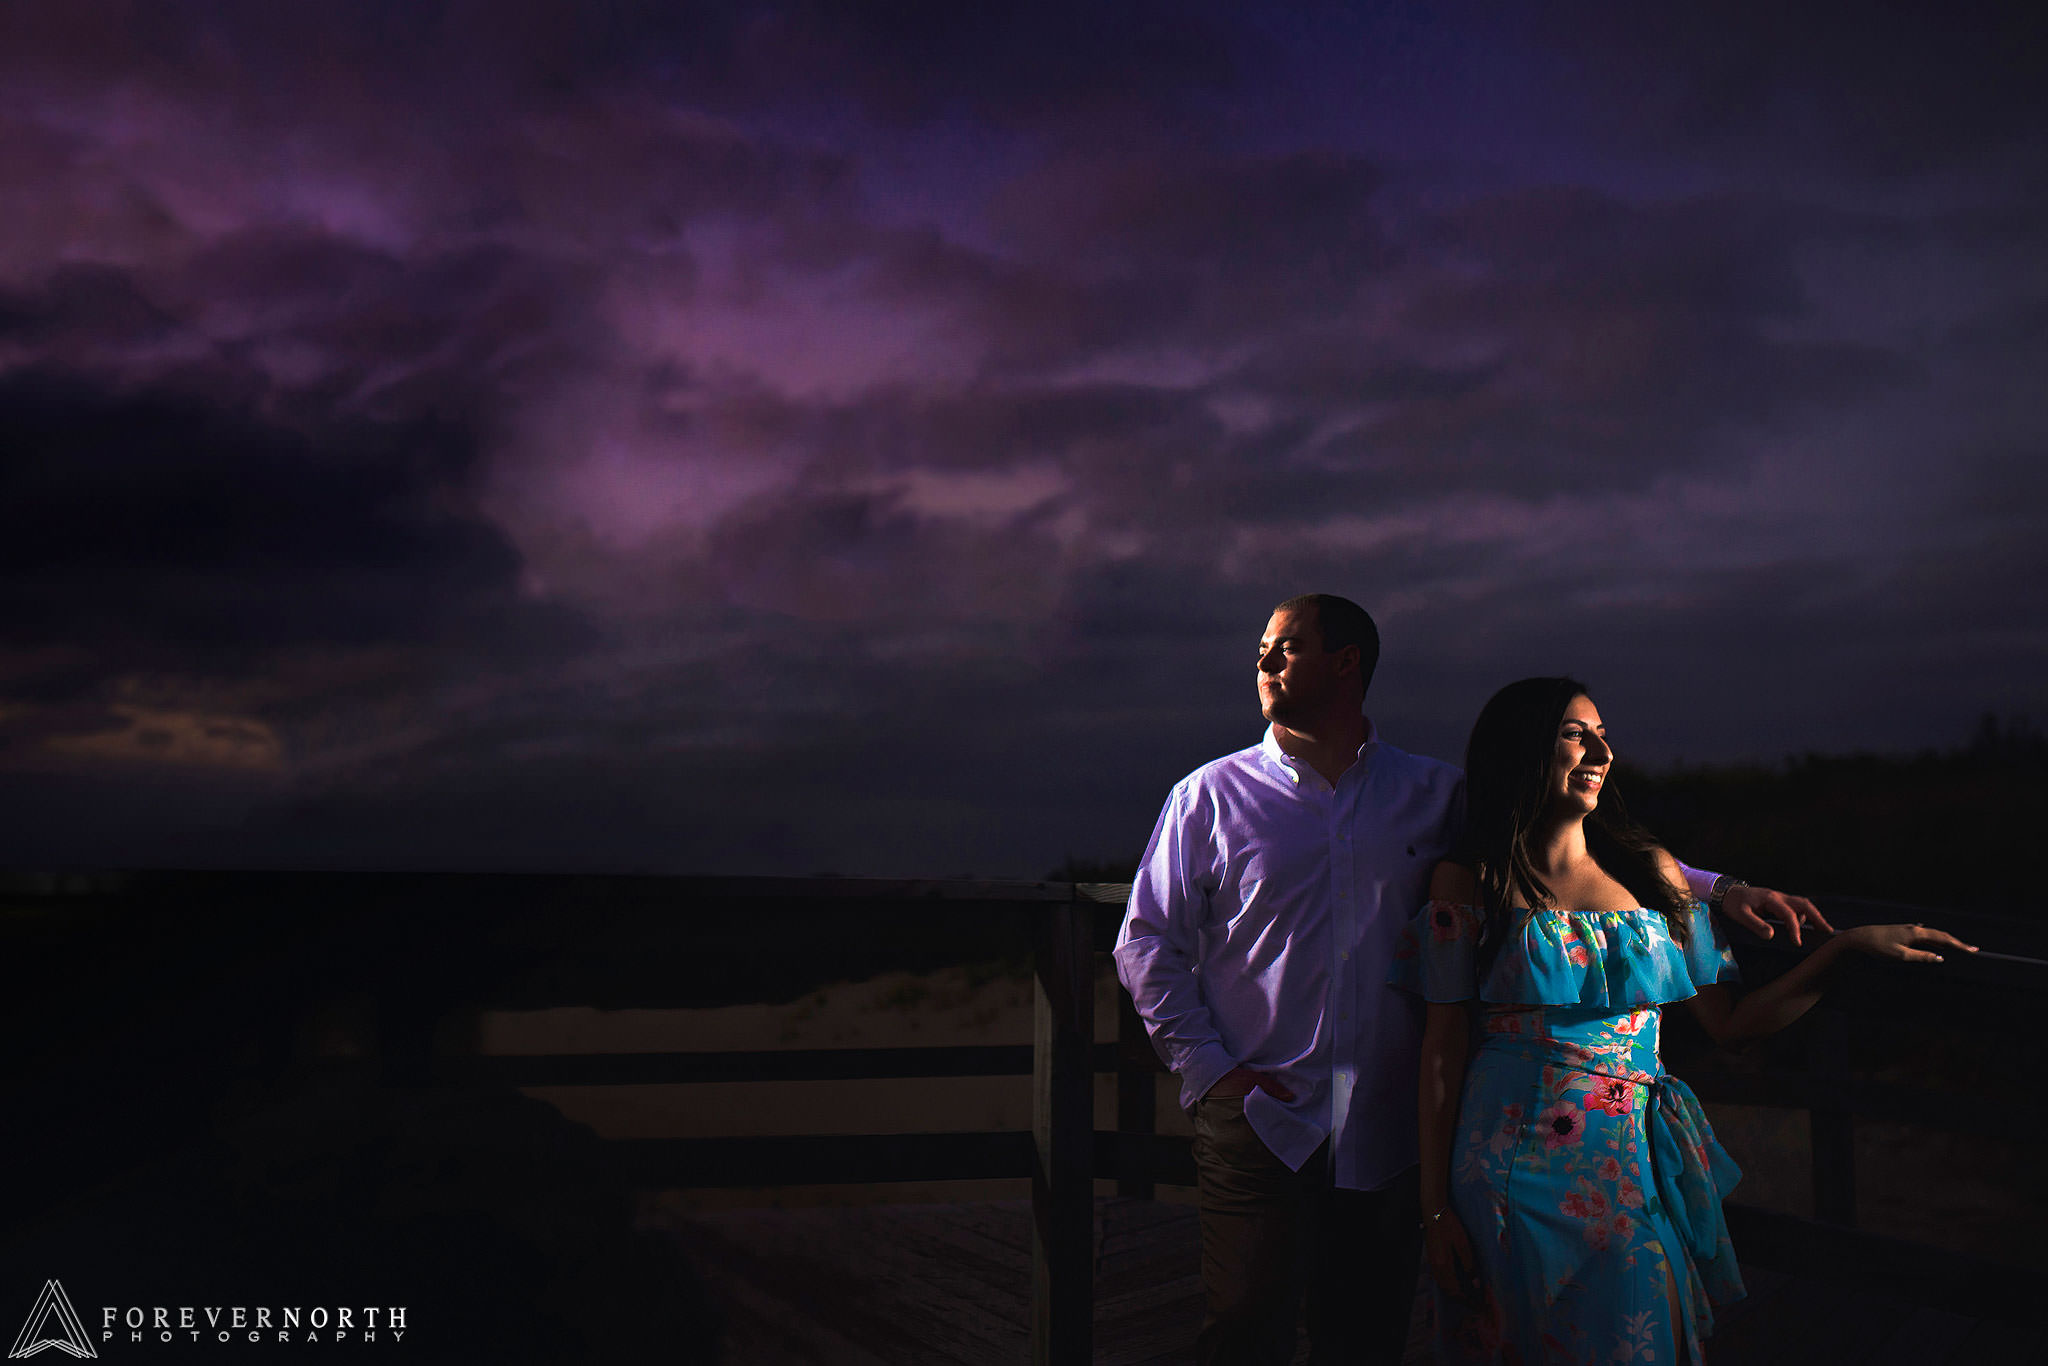 Martin-Manasquan-Beach-Engagement-Photos-06.jpg